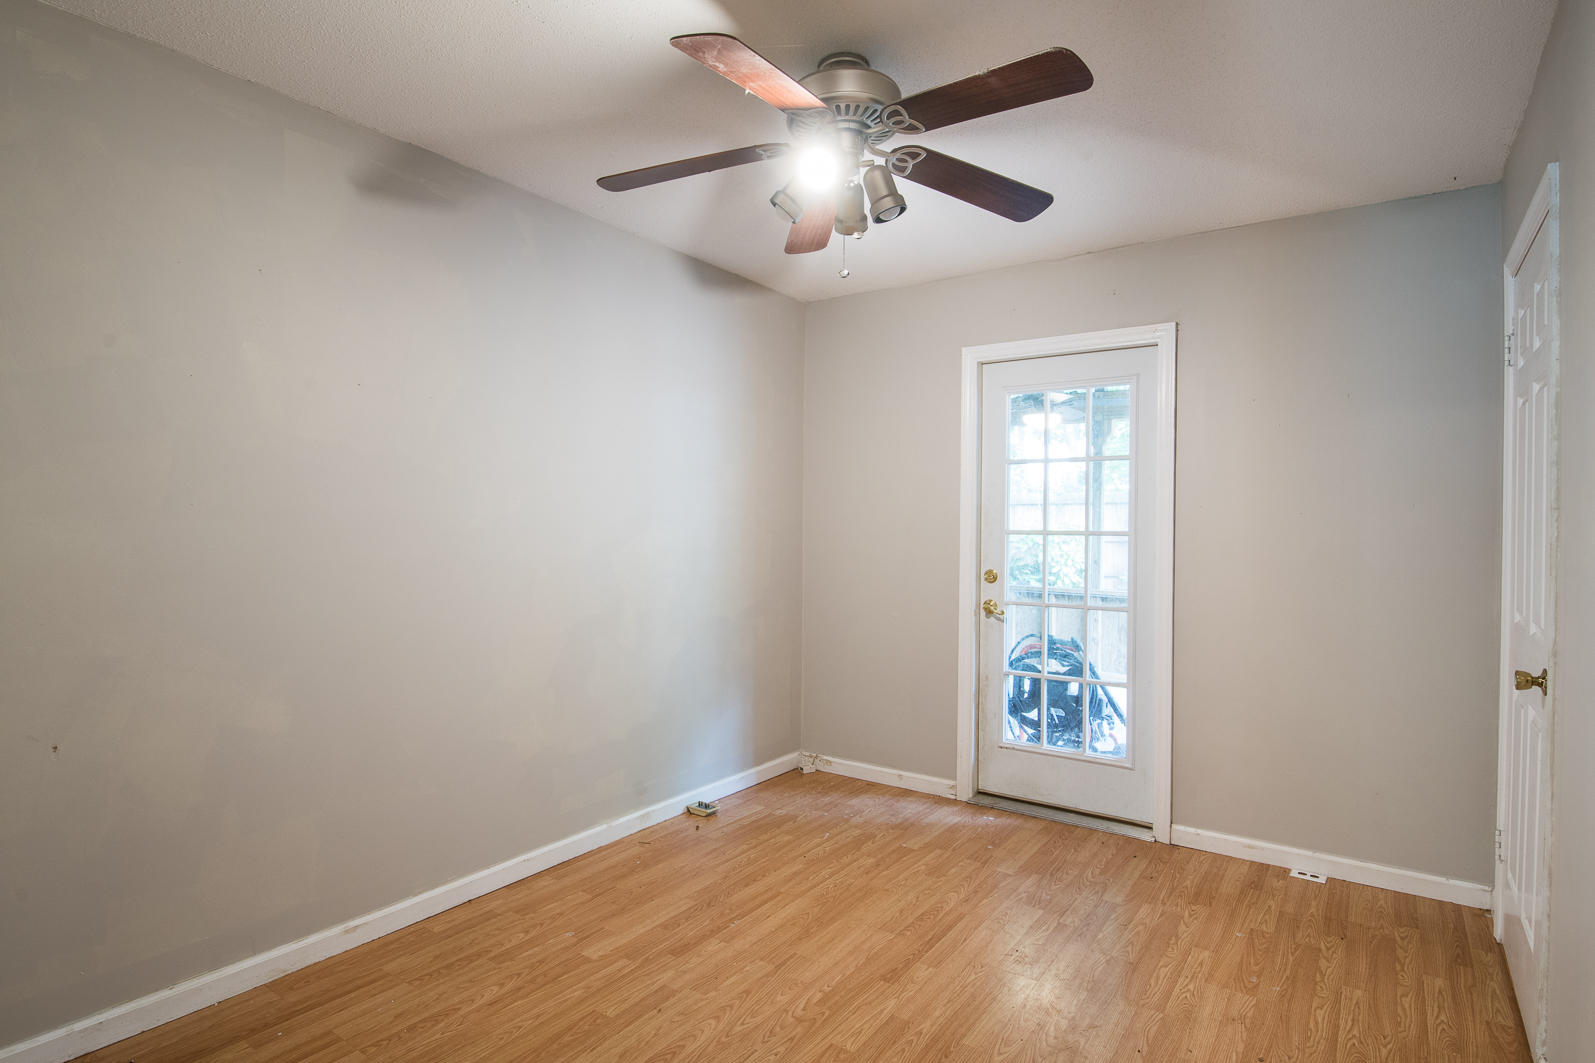 Wando East Homes For Sale - 1605 Babington, Mount Pleasant, SC - 16